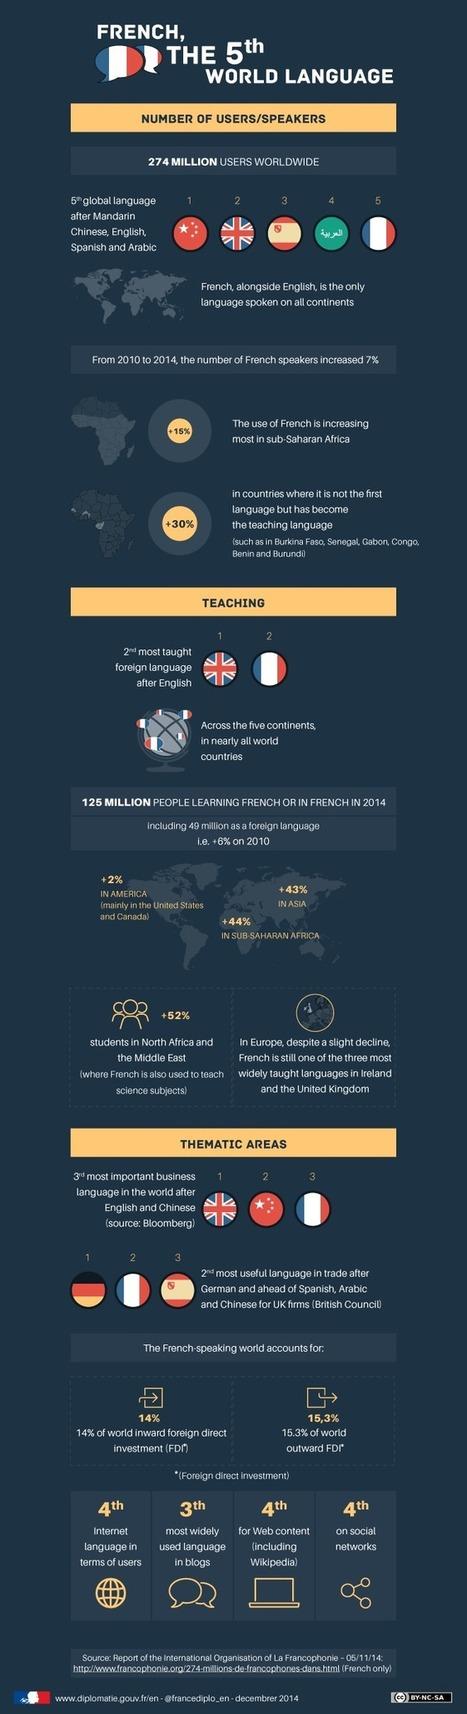 Infographic : French, the 5th World Language | Translators Make The World Go Round | Scoop.it